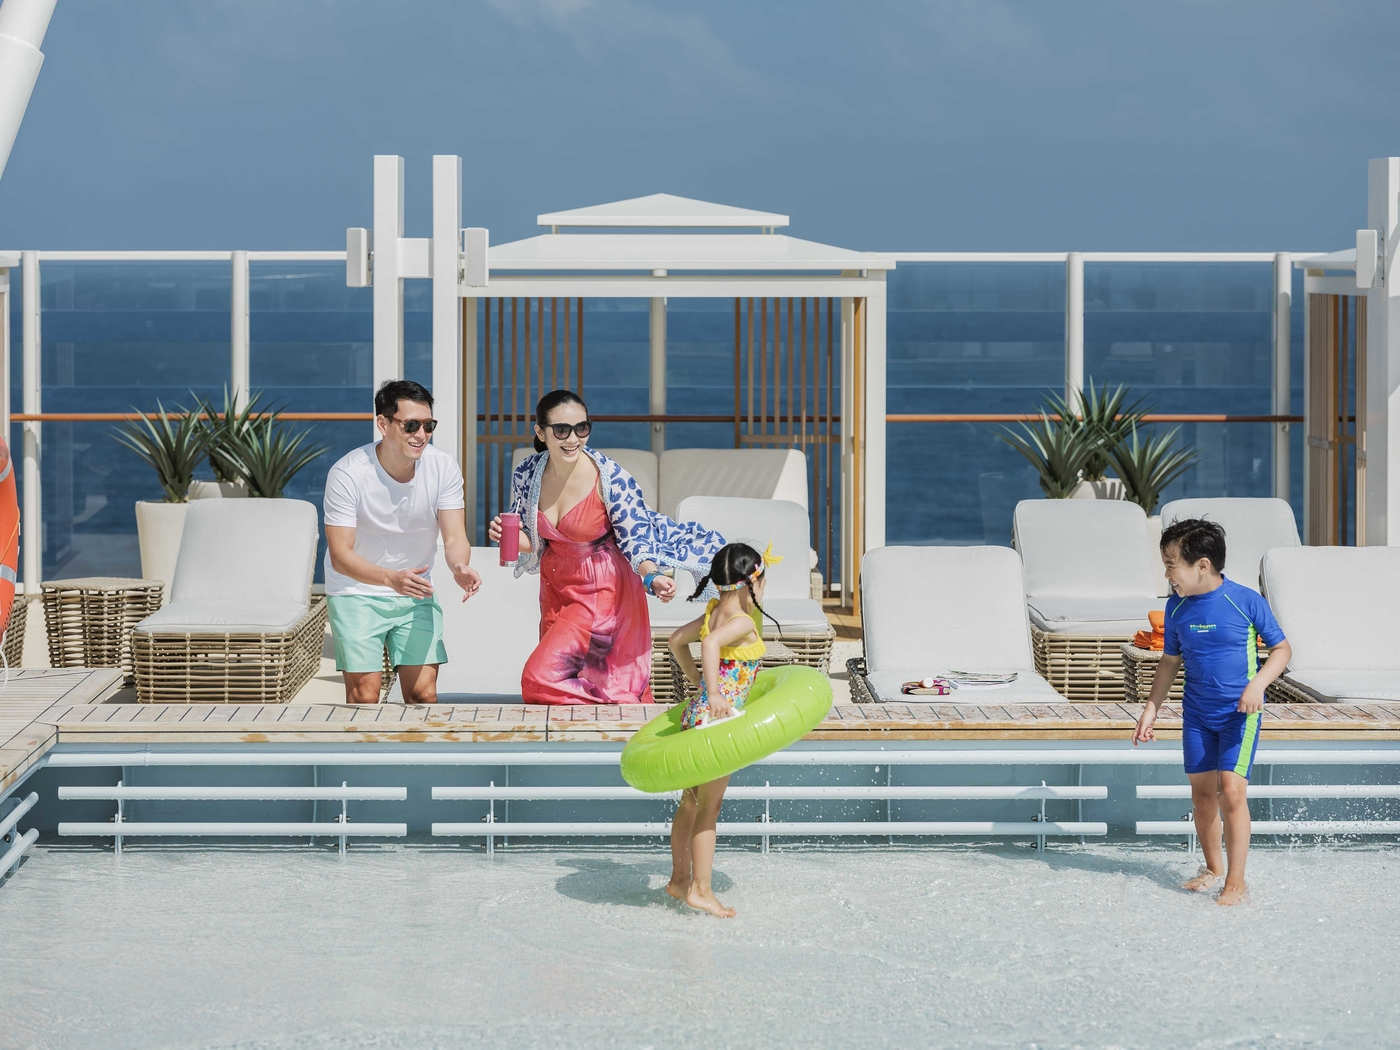 World Dream Hong Kong The Palace Pool deck